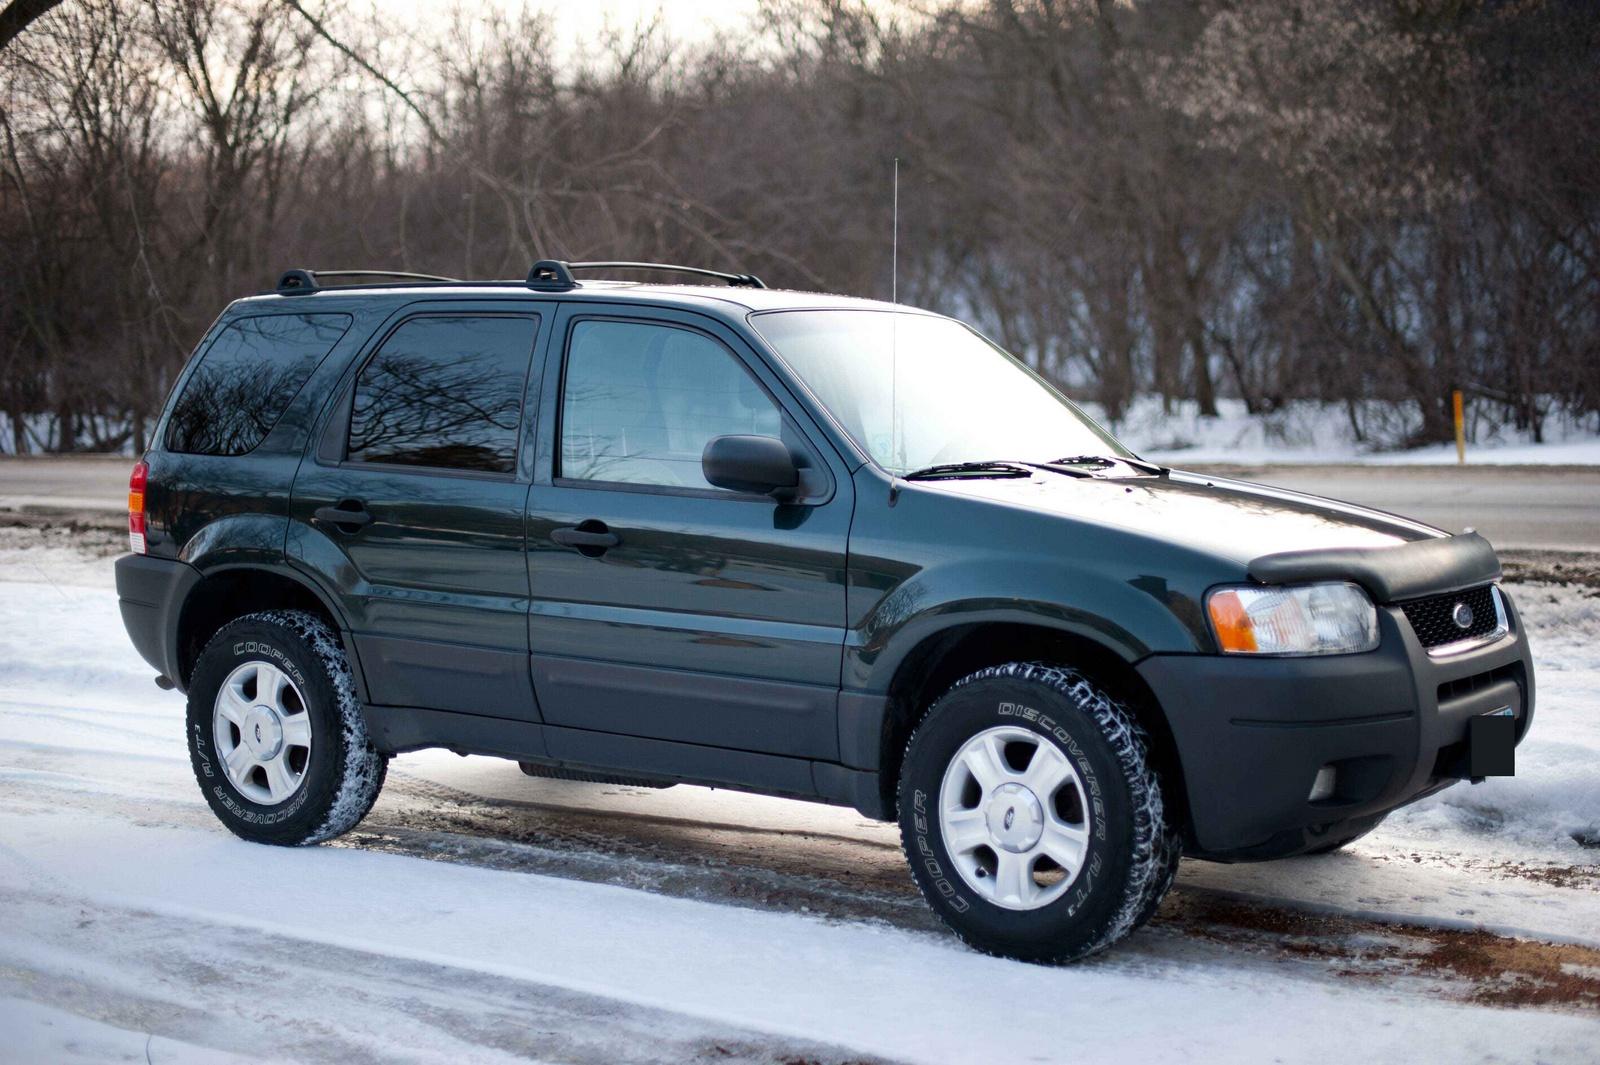 2006 ford explorer price upcomingcarshq com toyota vitz 2000 user manual 2003 Toyota Vitz